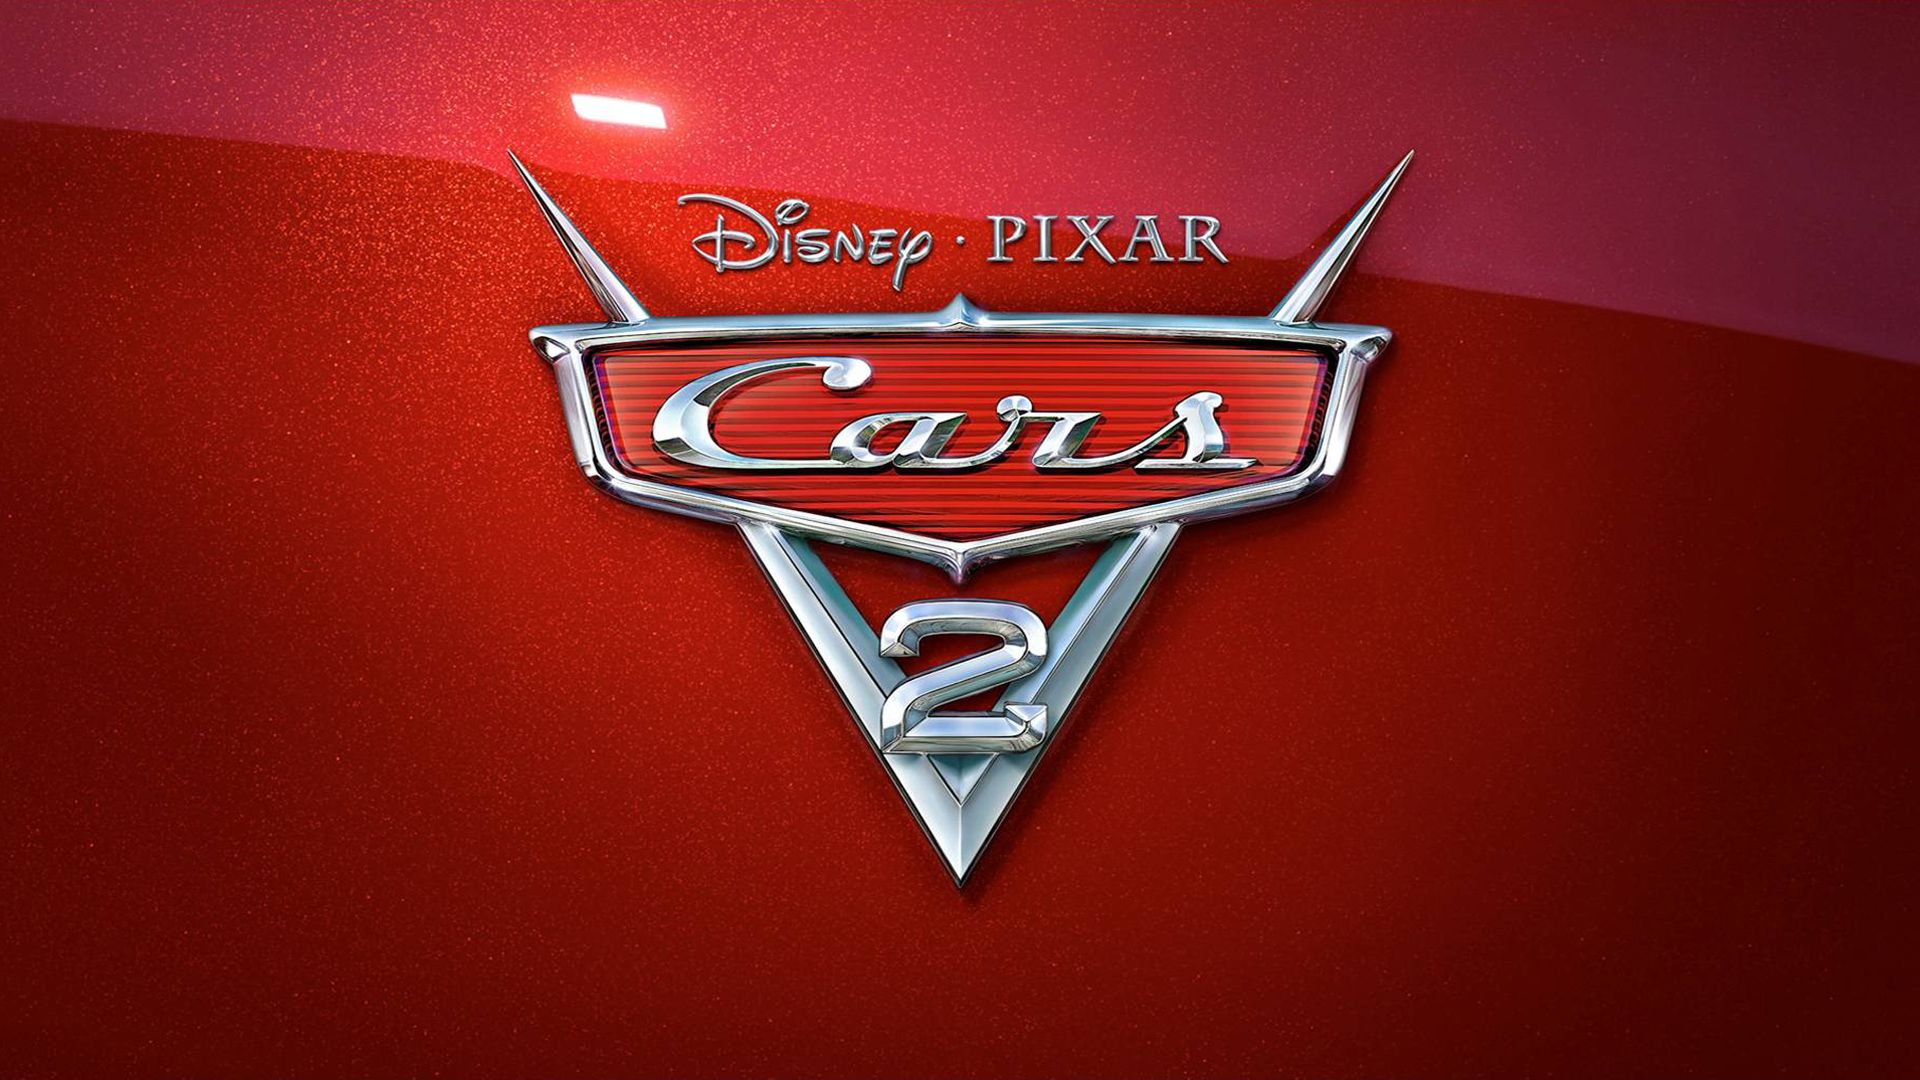 Disney Cars Logo Wallpaper With Images Disney Cars Disney